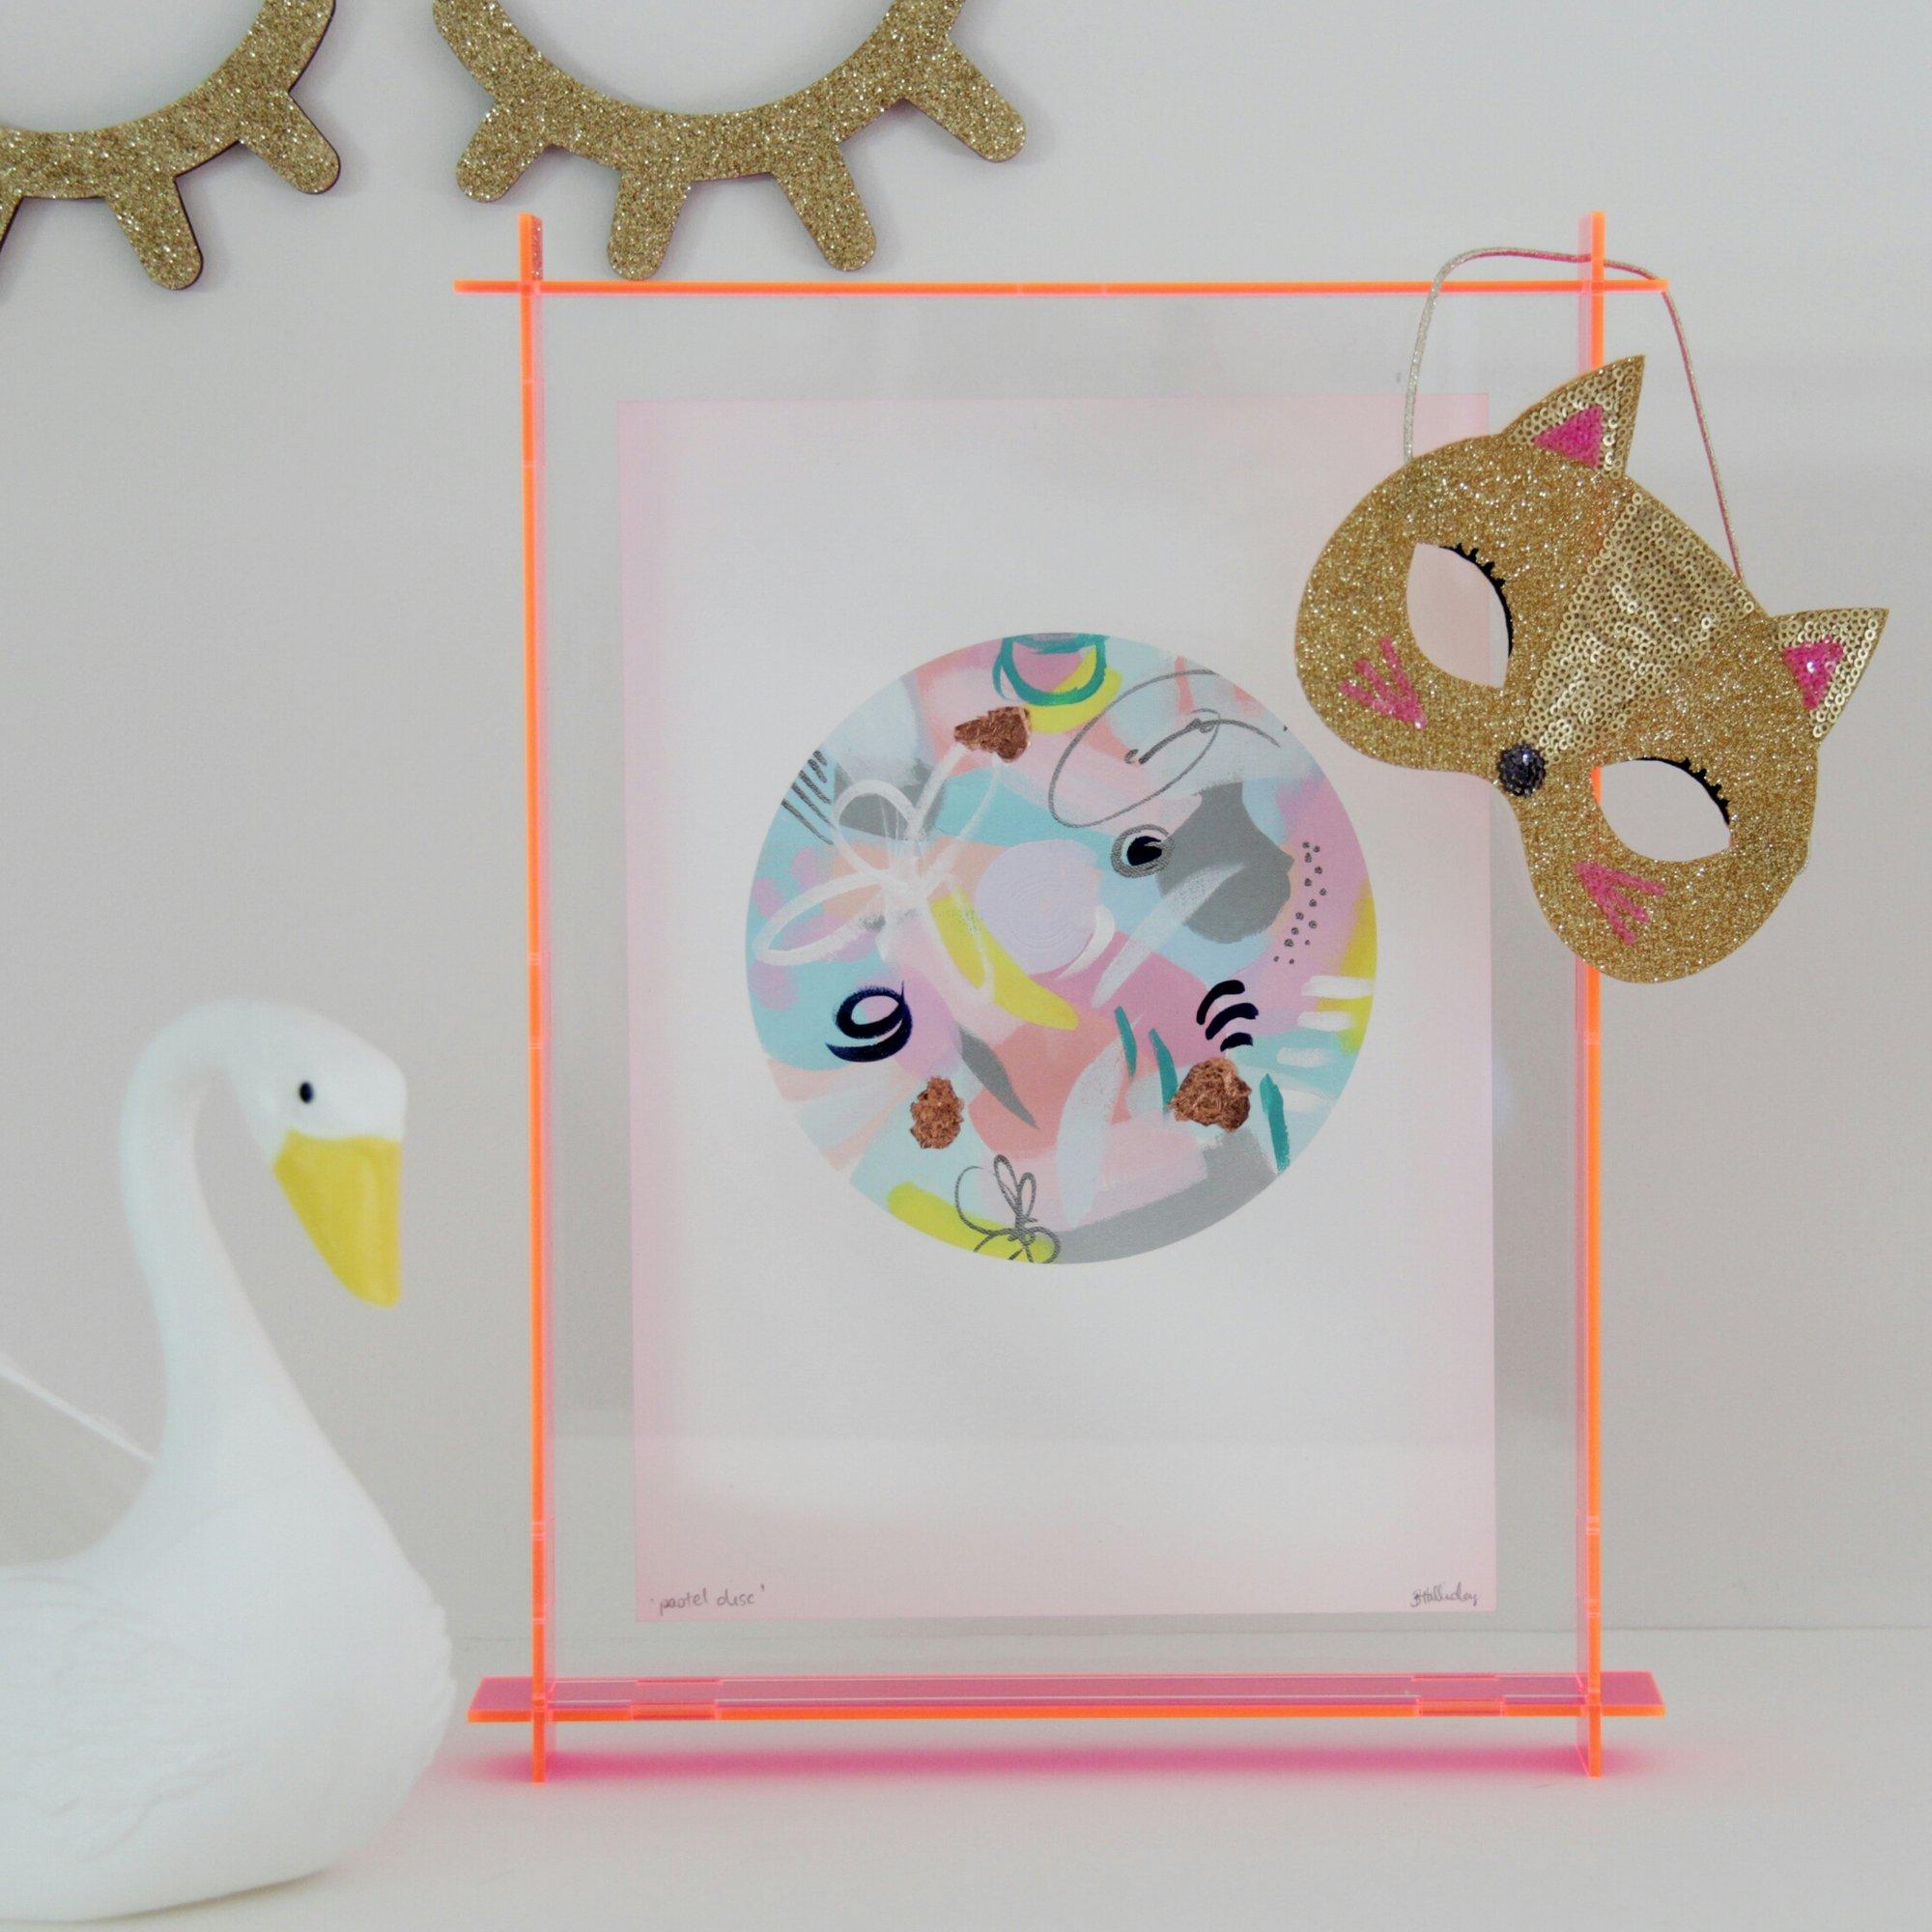 ac39b294b1a Lovestar Acrylic Neon Frames Rebecca Judd Loves Melbourne. Image Of A4  Acrylic Box Frame Fluro Pink Transpa. Lecky A4 Acrylic Box Frame Fluro Pink  Transpa